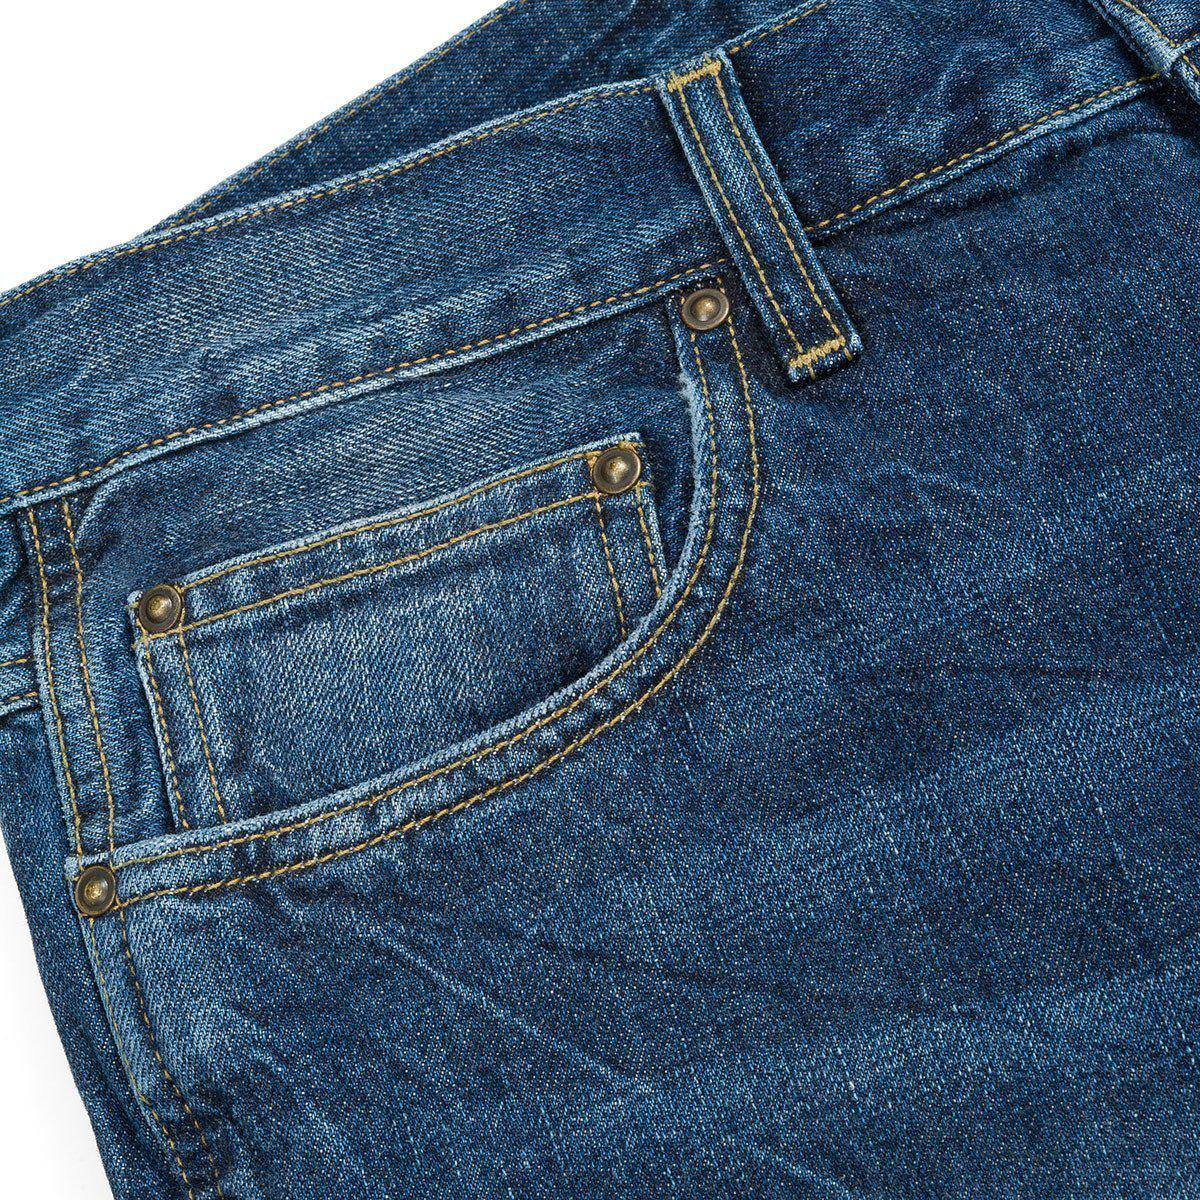 Carhartt Denim Wip Western Pant Ii Edgewood Jean Women's Jeans In Pink